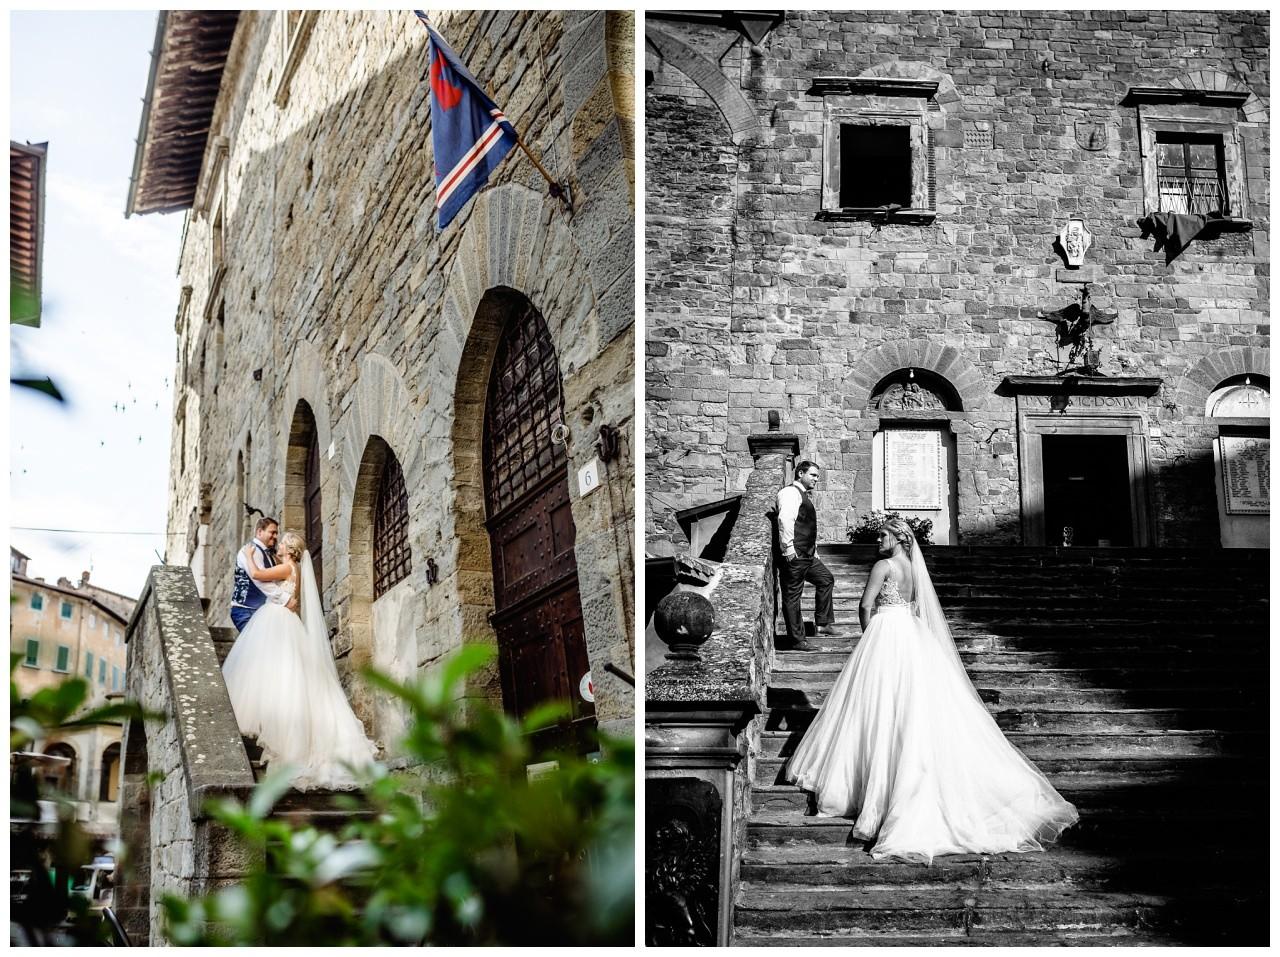 Hochzeitsfotos Toskana Fotograf After Wedding Shooting Italien 28 - After Wedding Shooting in der Toskana